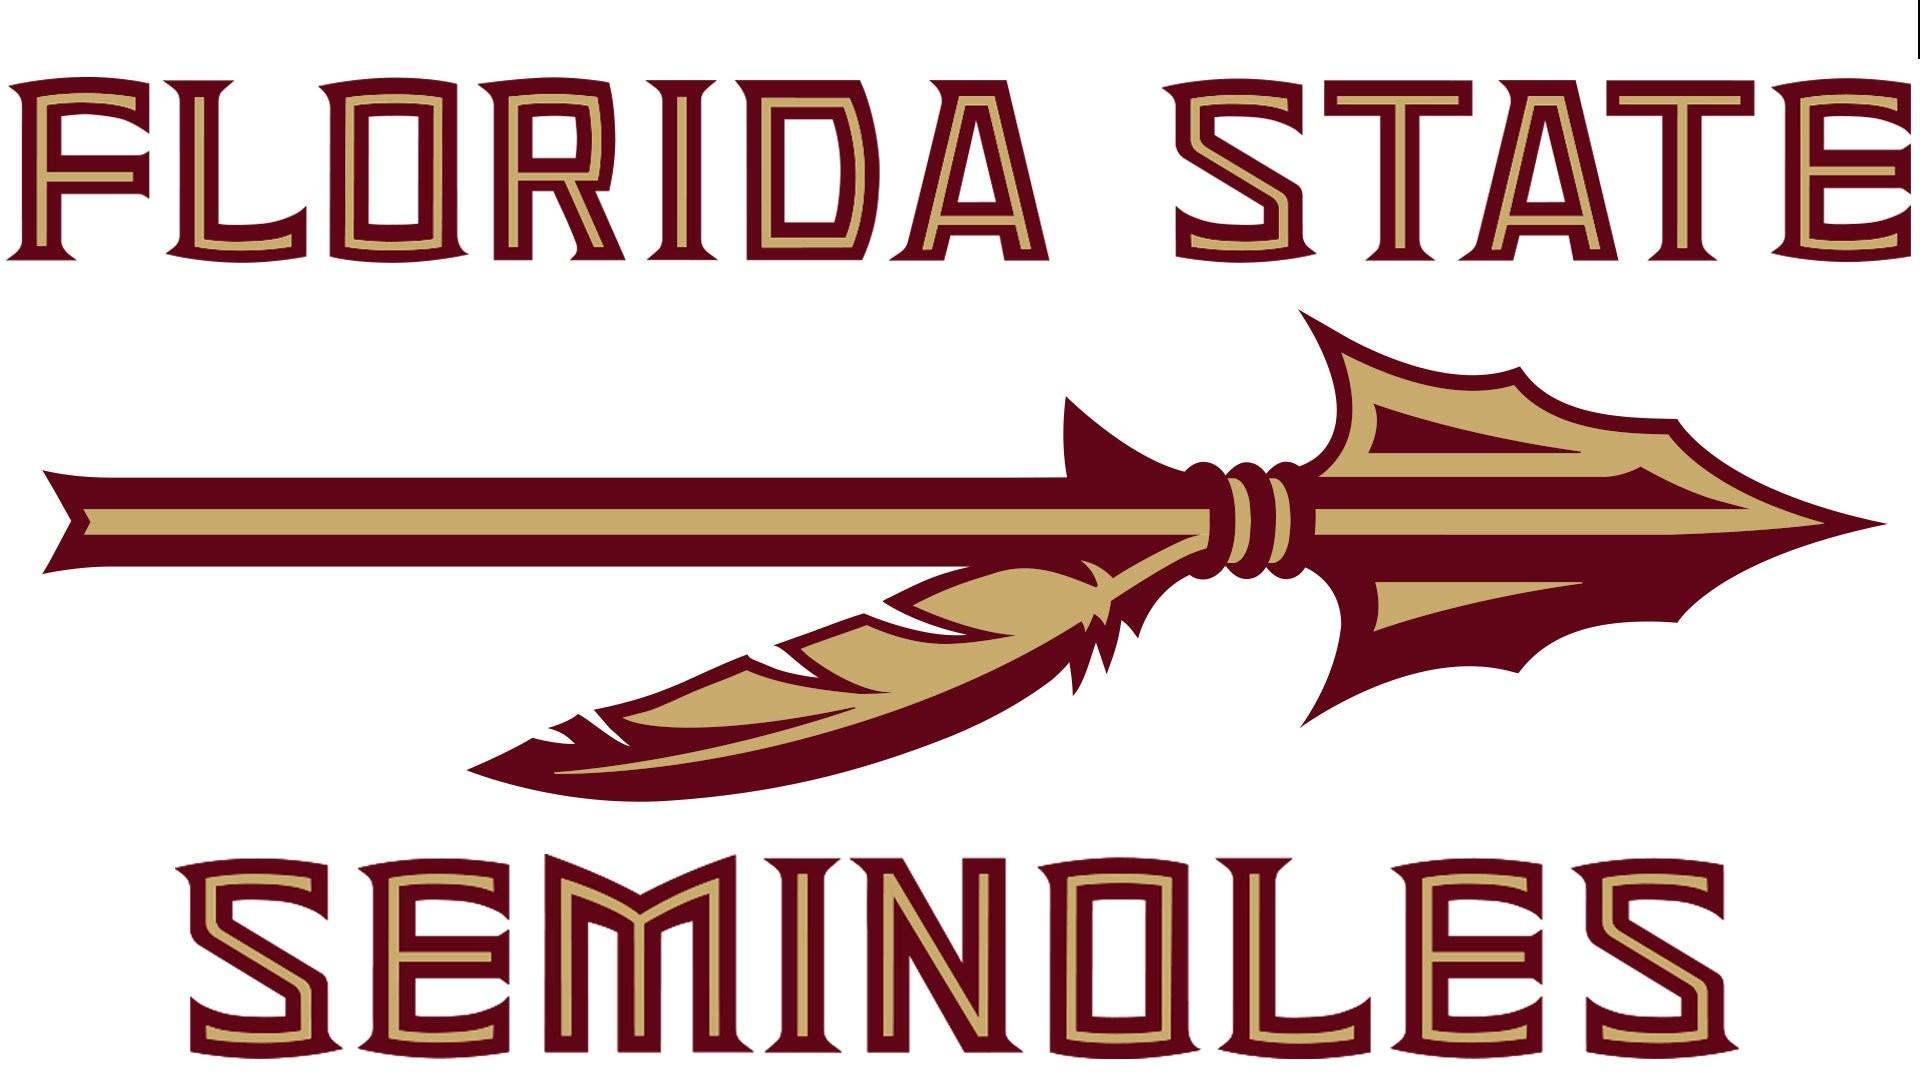 FLORIDA STATE SEMINOLES college football wallpaper     592784    WallpaperUP